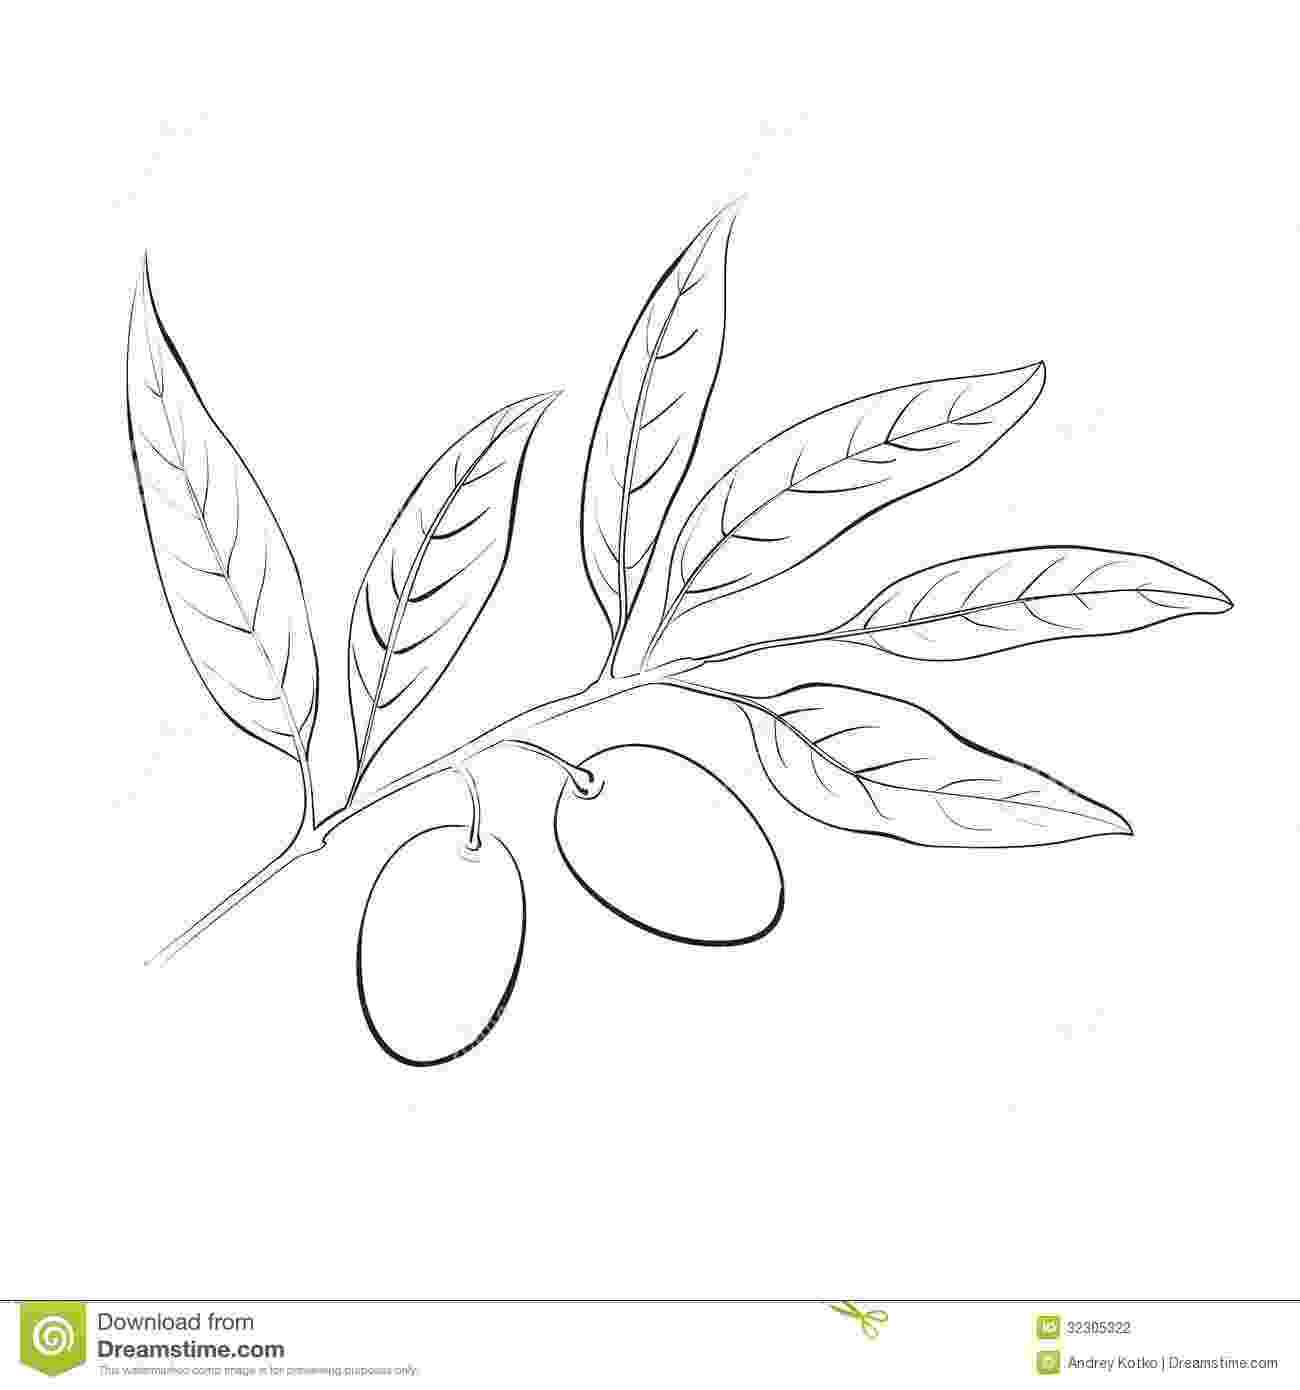 olive branch sketch hand drawn vector illustration olive branch stock vector sketch olive branch